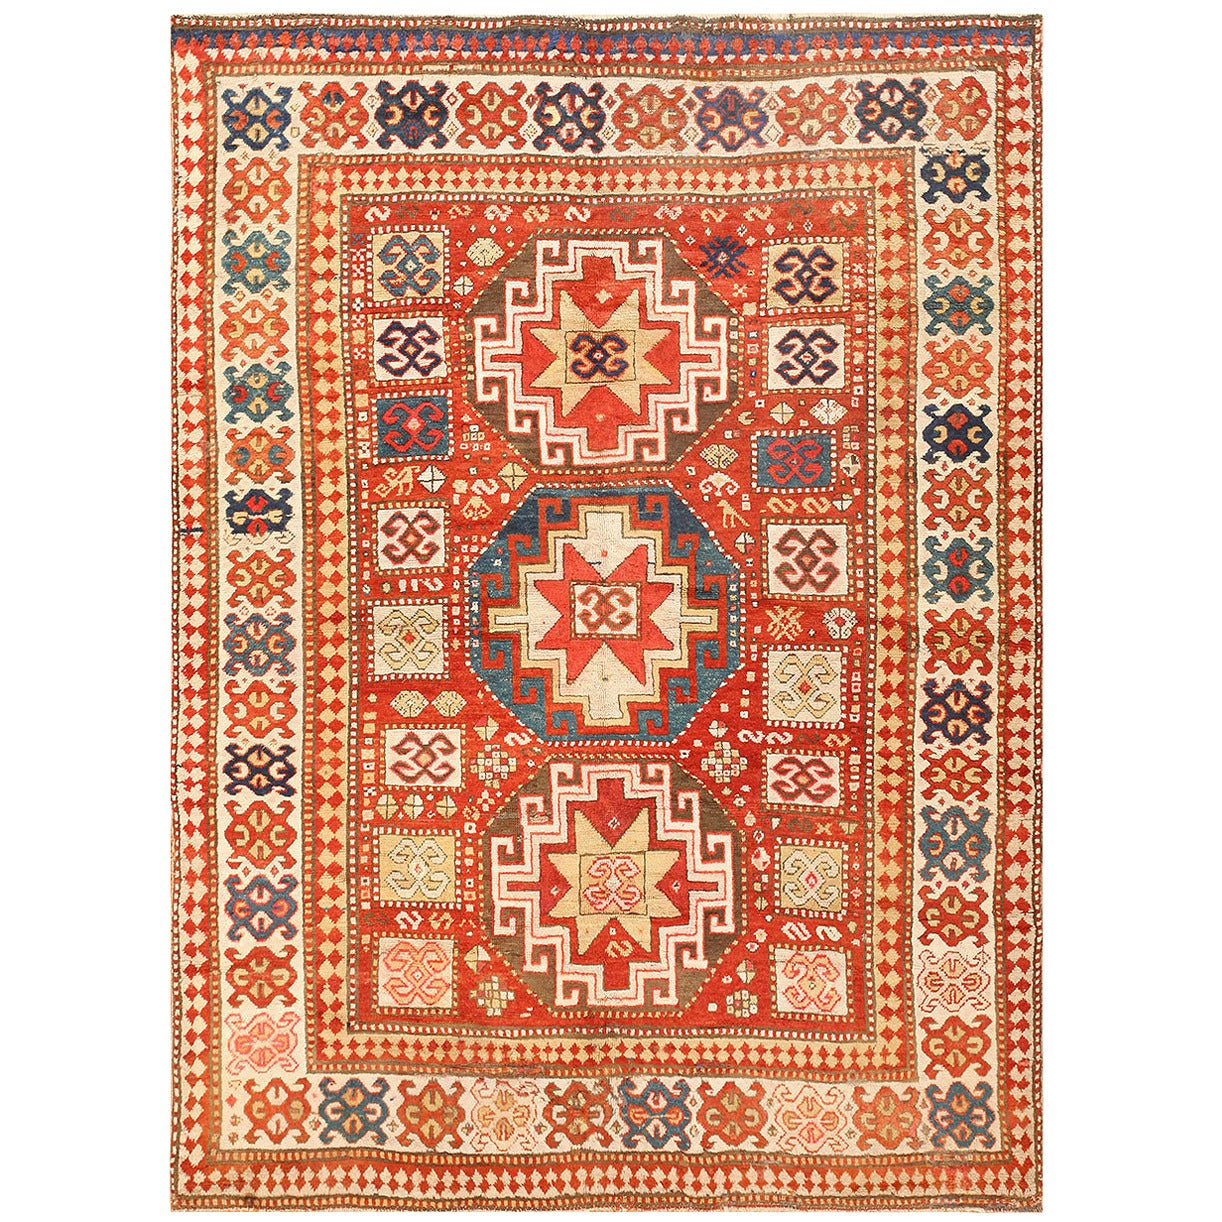 Antique Tribal Kazak Rug